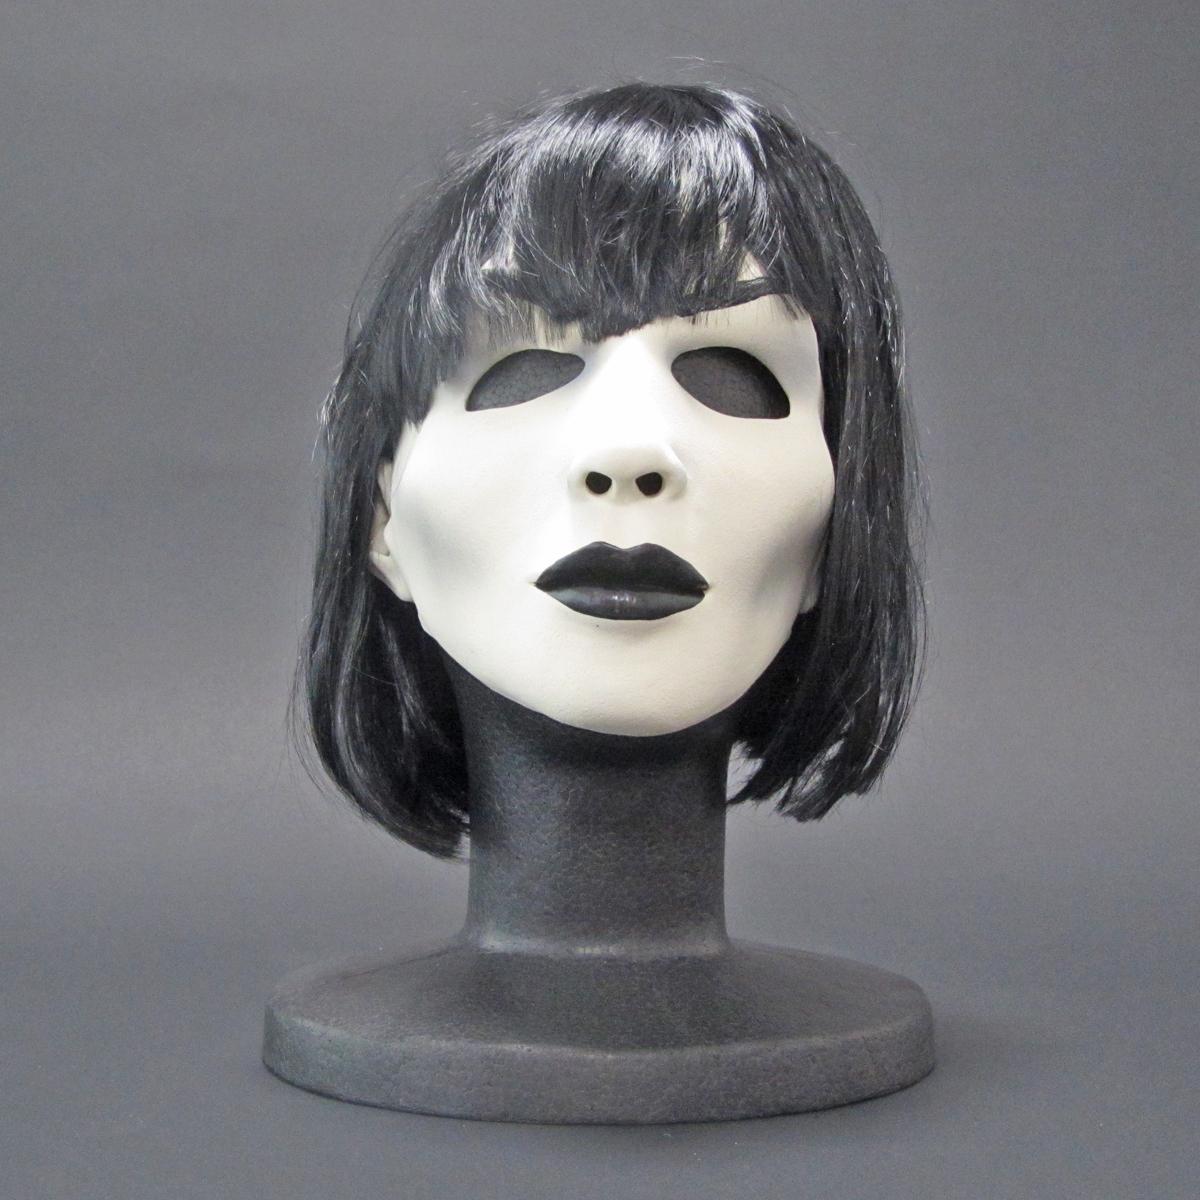 <Hot Goth>Zagone Studios ザゴーニ スタジオ マスク ハロウィン コスプレ ホラー イベント 女装 仮装 ハンドメイド アメリカ製 正規品_画像2